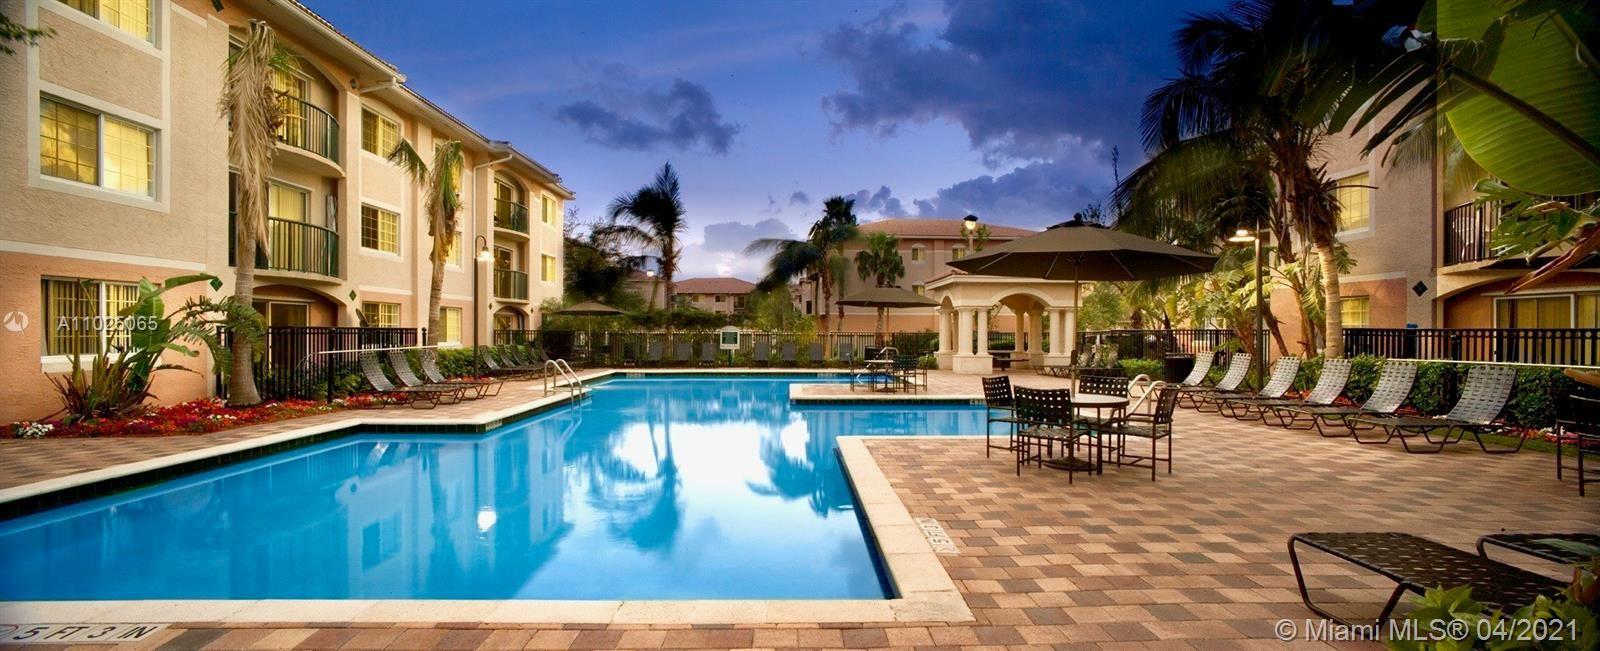 2027 SE 10th AVE #826, Fort Lauderdale, FL 33316 - #: A11025065